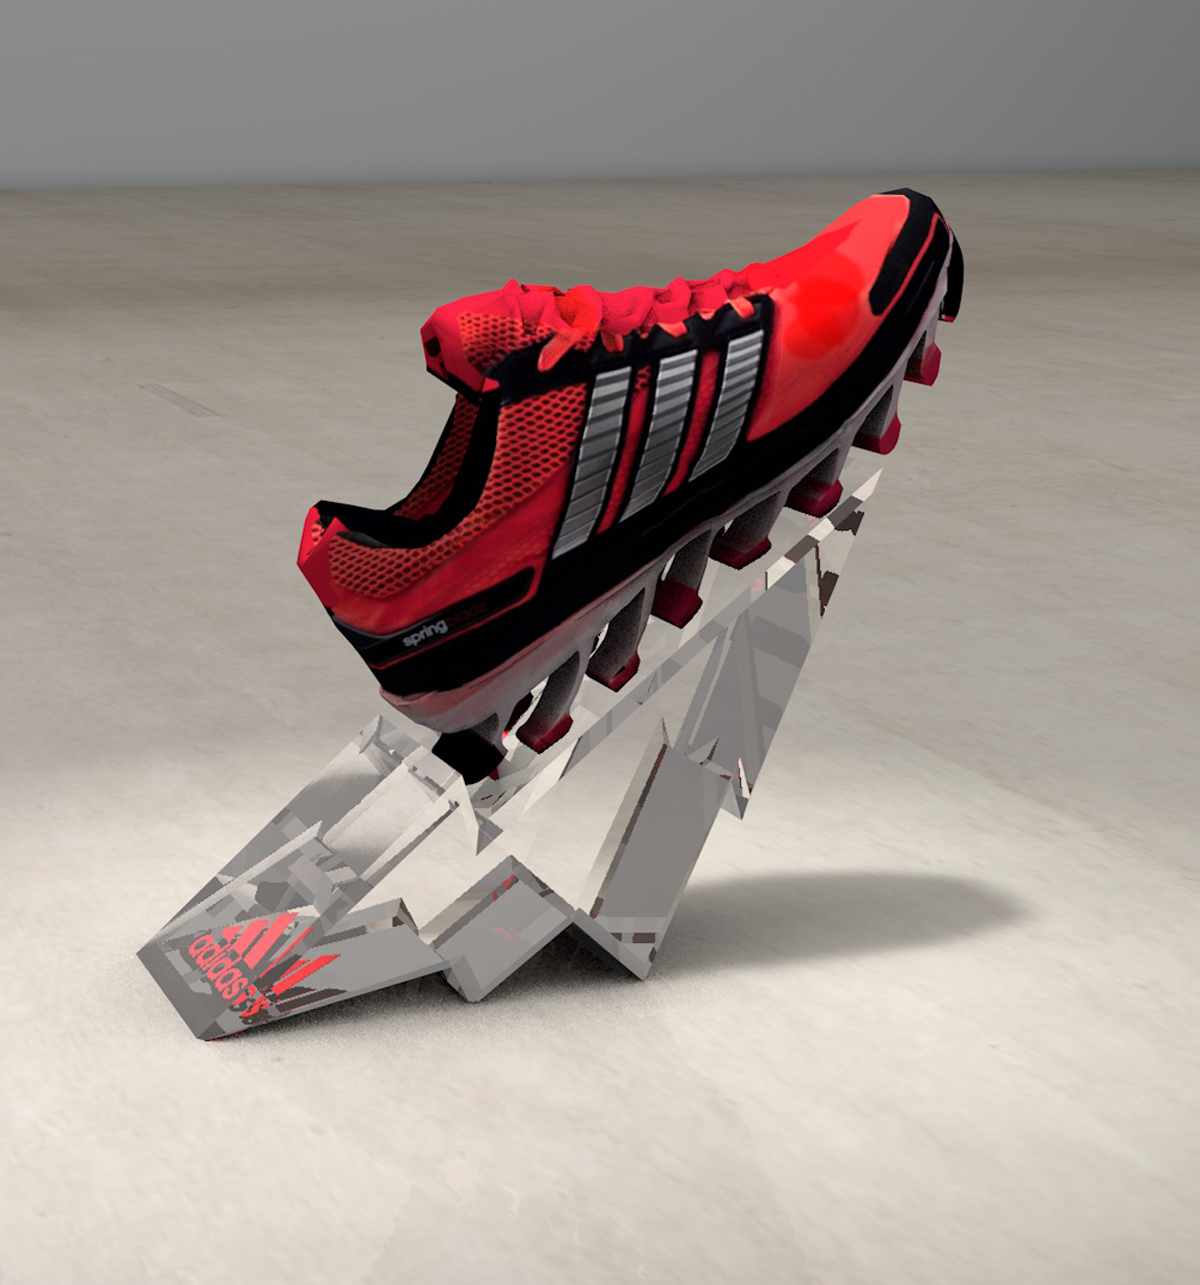 adidas Springblade shoe highlight render